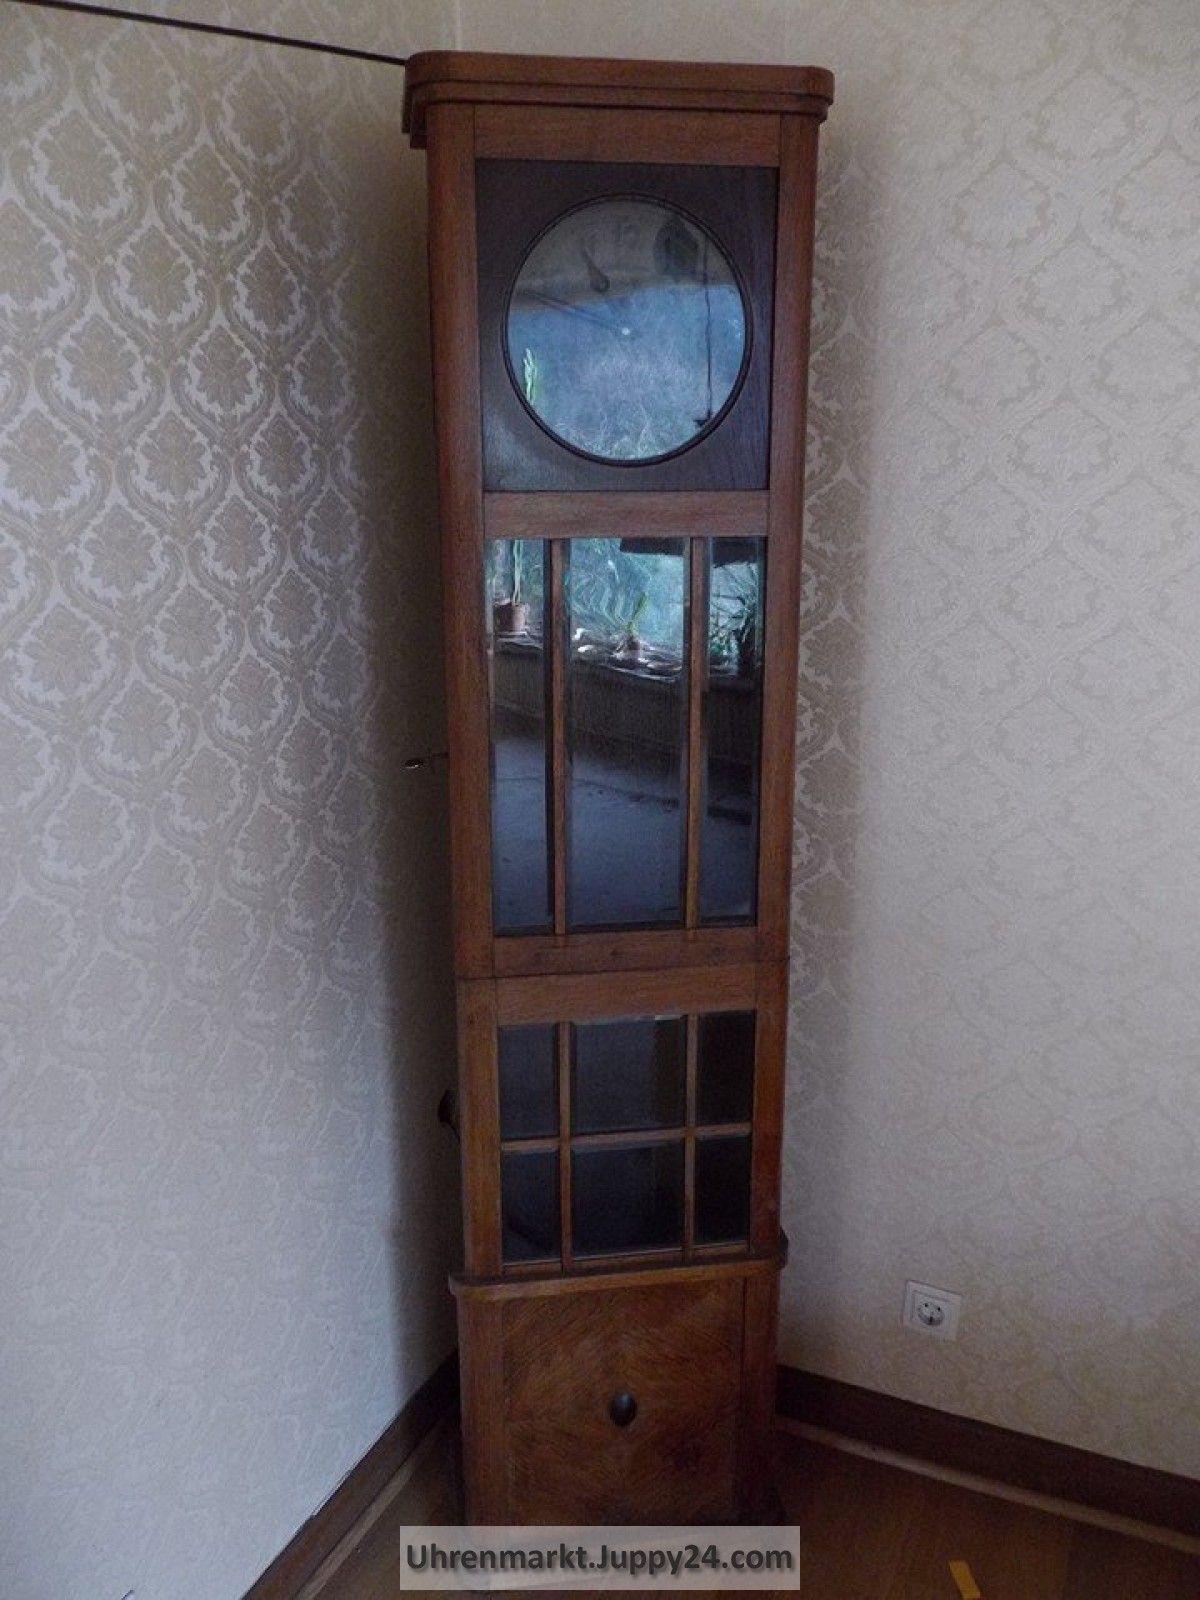 Antike standuhr mechanische standuhren tischuhren wanduhren standuhren tischuhren - Antike wanduhren ...